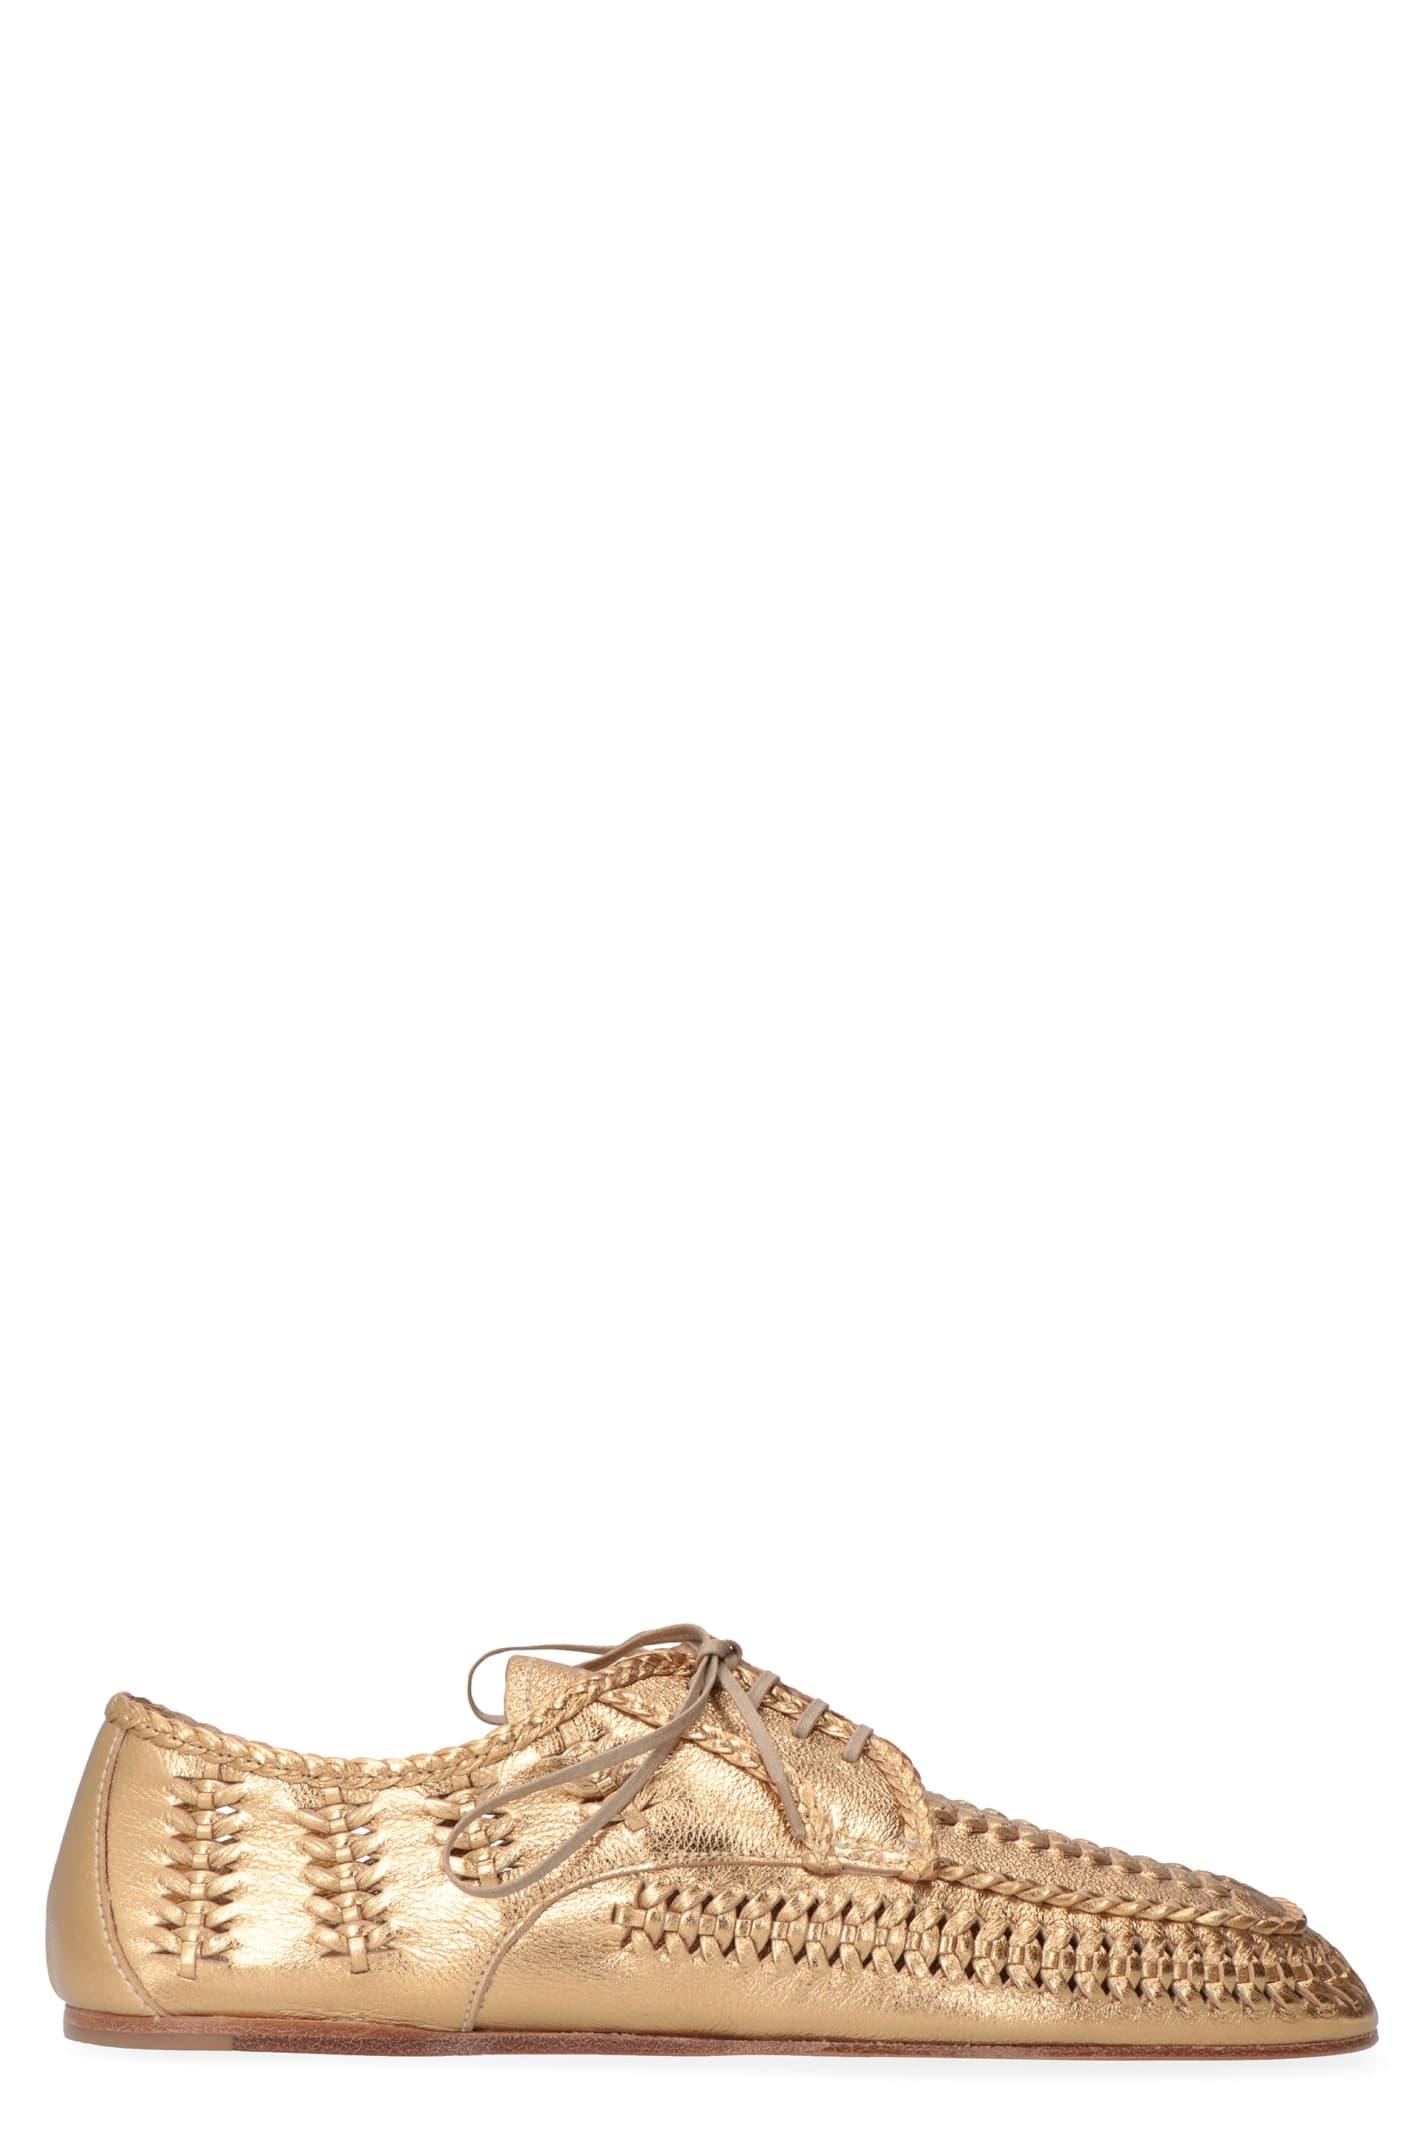 Prada Metallic Leather Lace-up Shoes